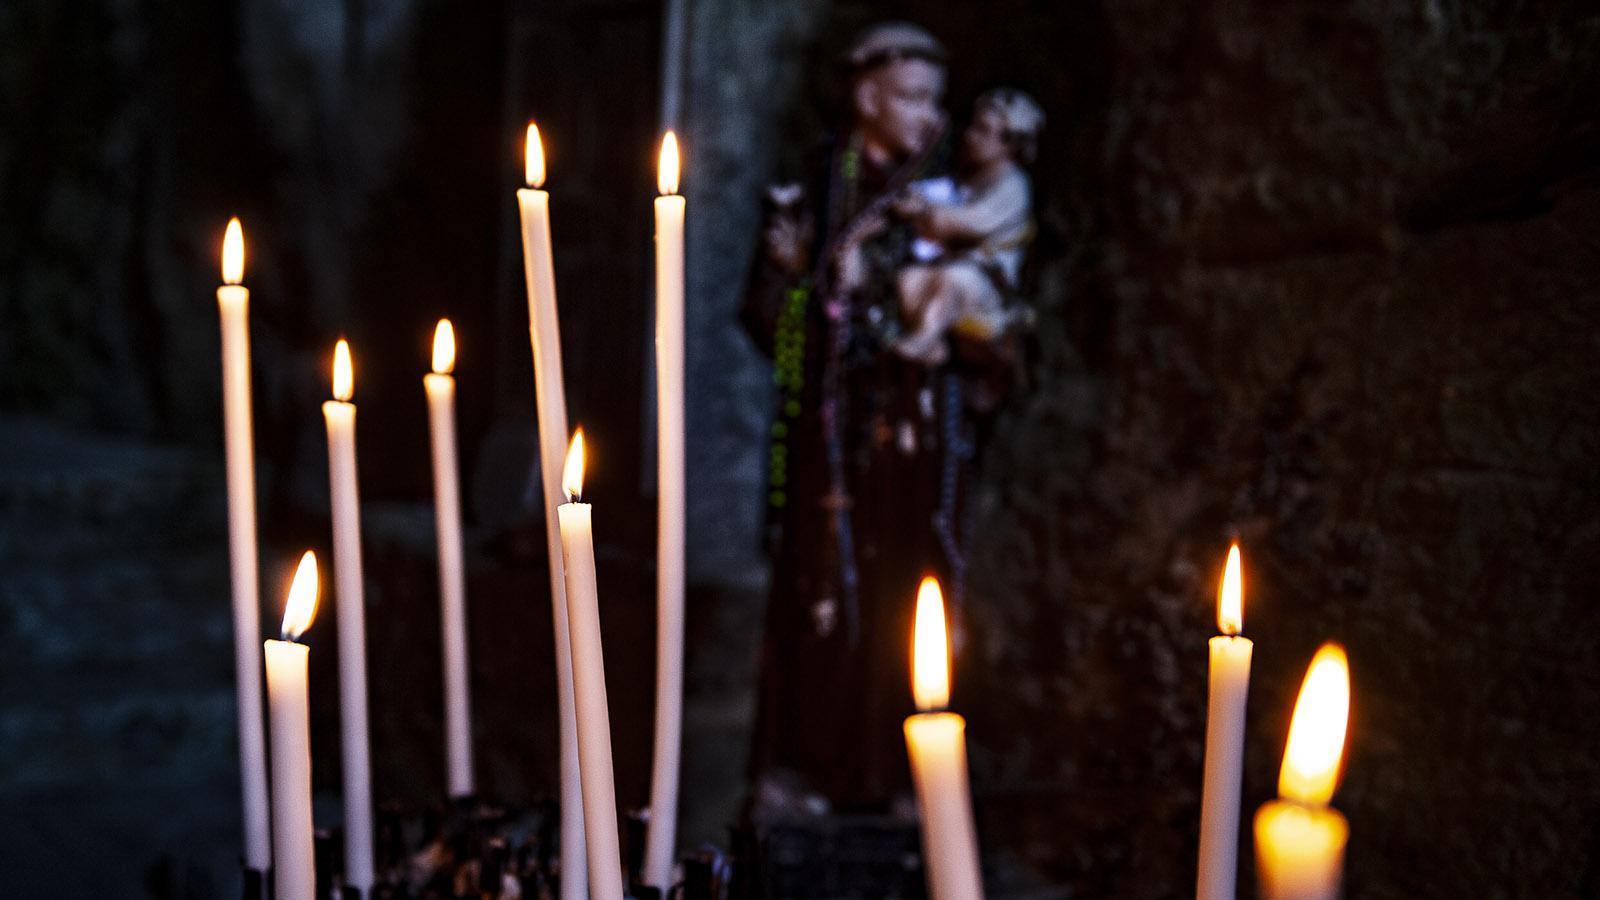 Gorges de Galamus: Kerzen für Saint-Antoine. Foto: Hilke Maunder